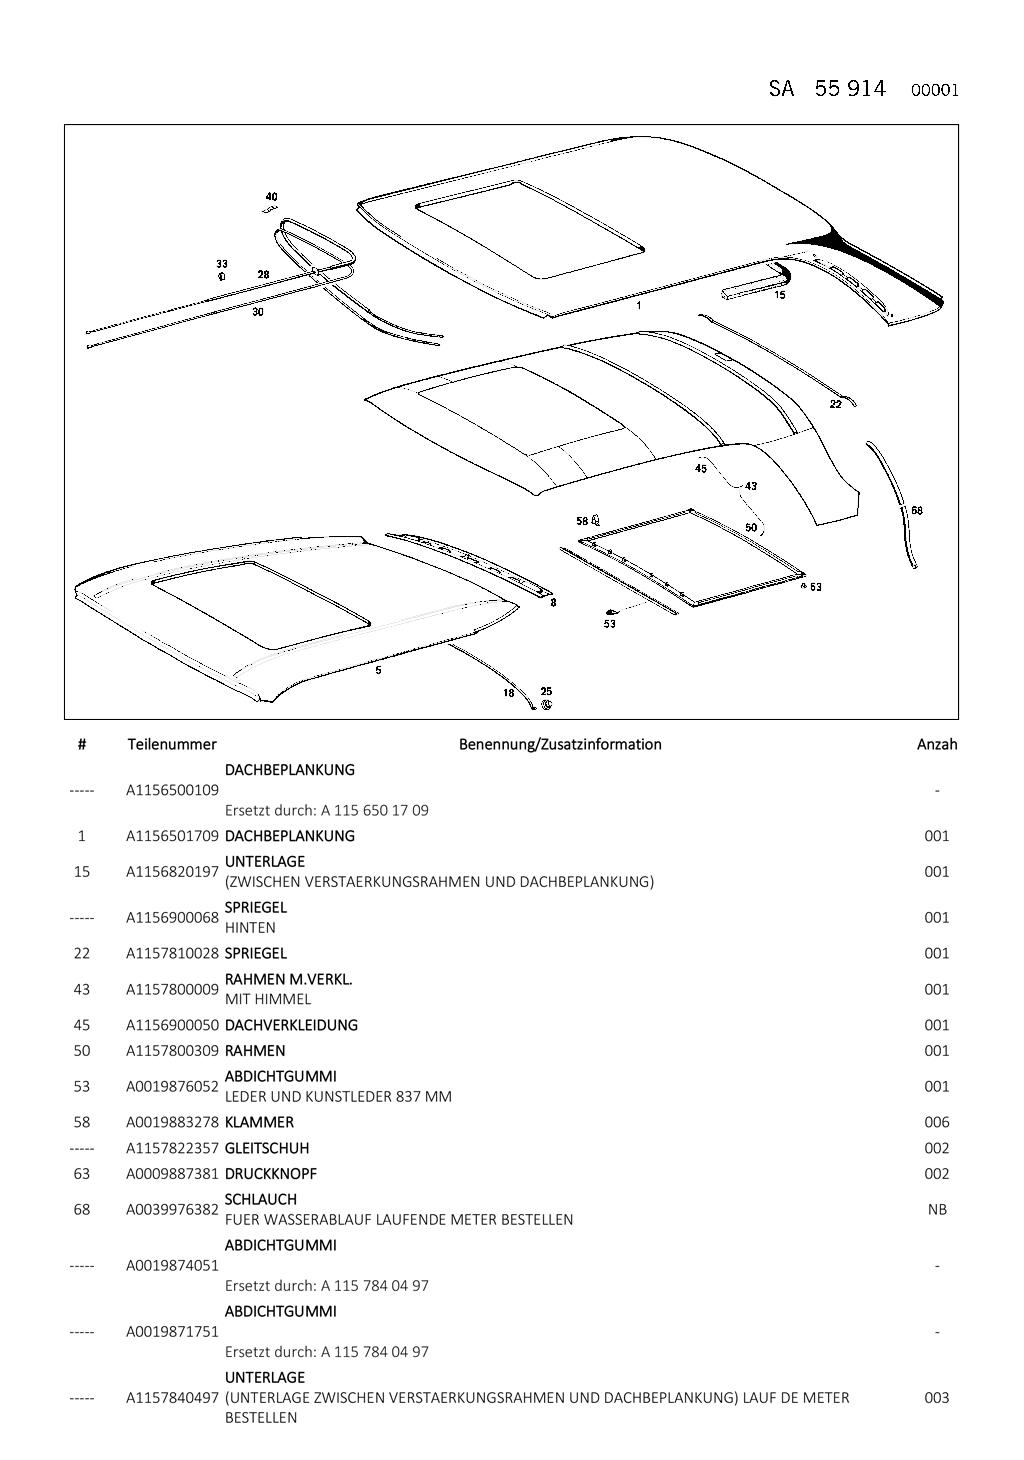 https://kranich-automobile.de/content/img/uploads/img7416.png